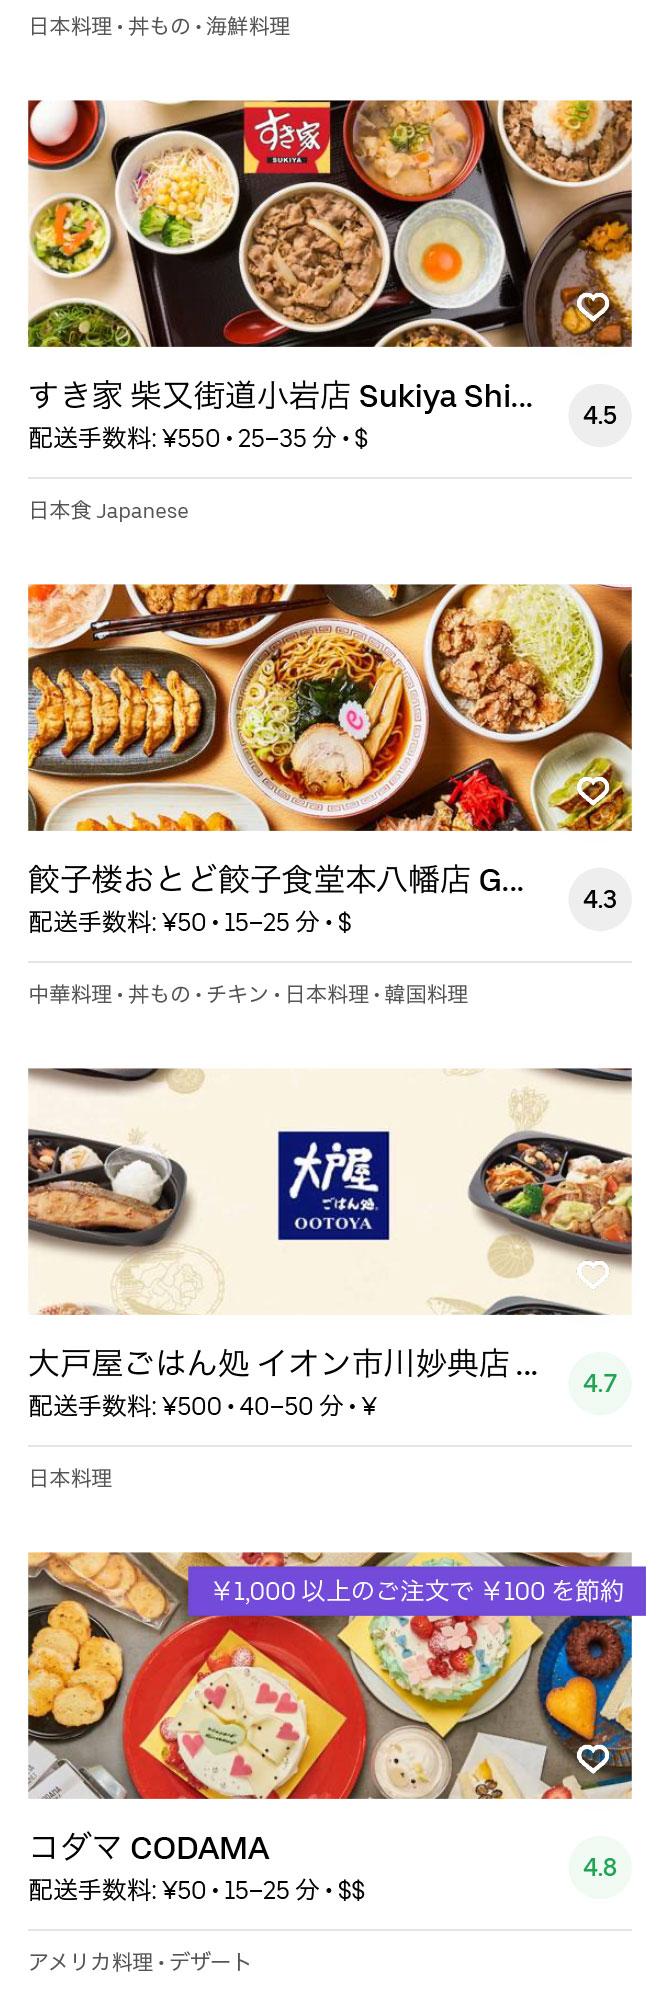 Ichikawa motoyawata menu 2004 08